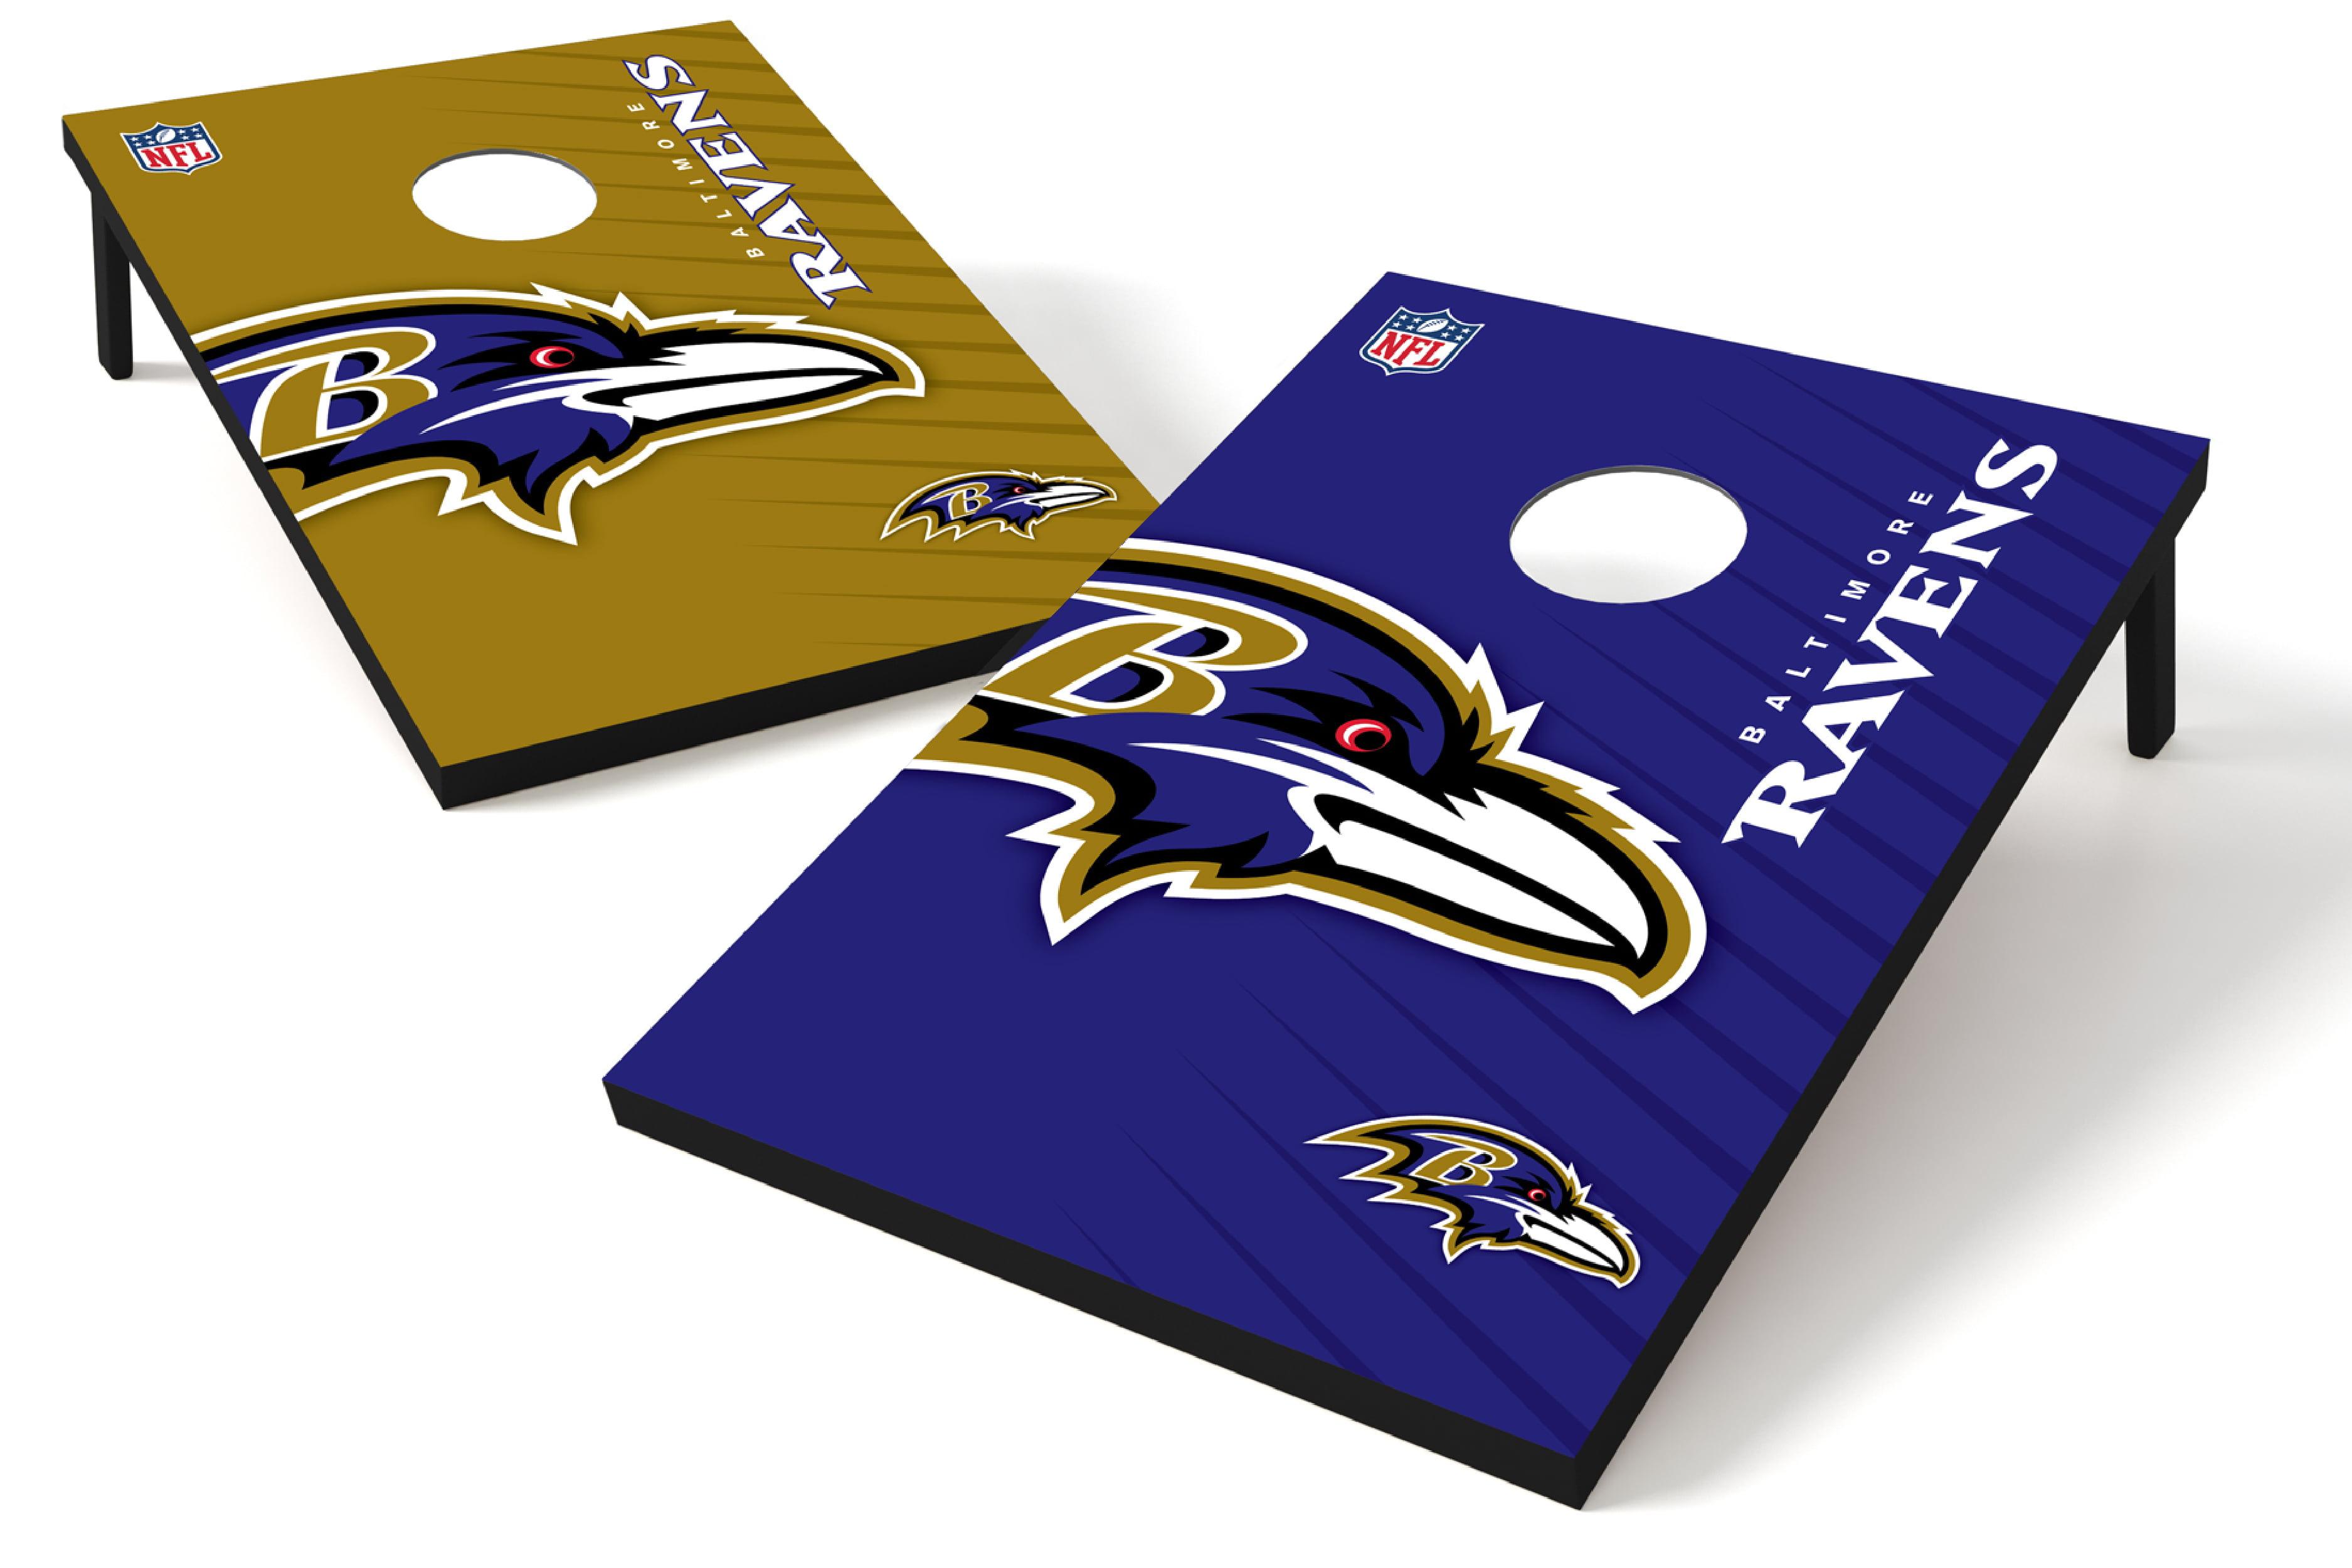 2x3 Bean Bag Toss - NFL Baltimore Ravens